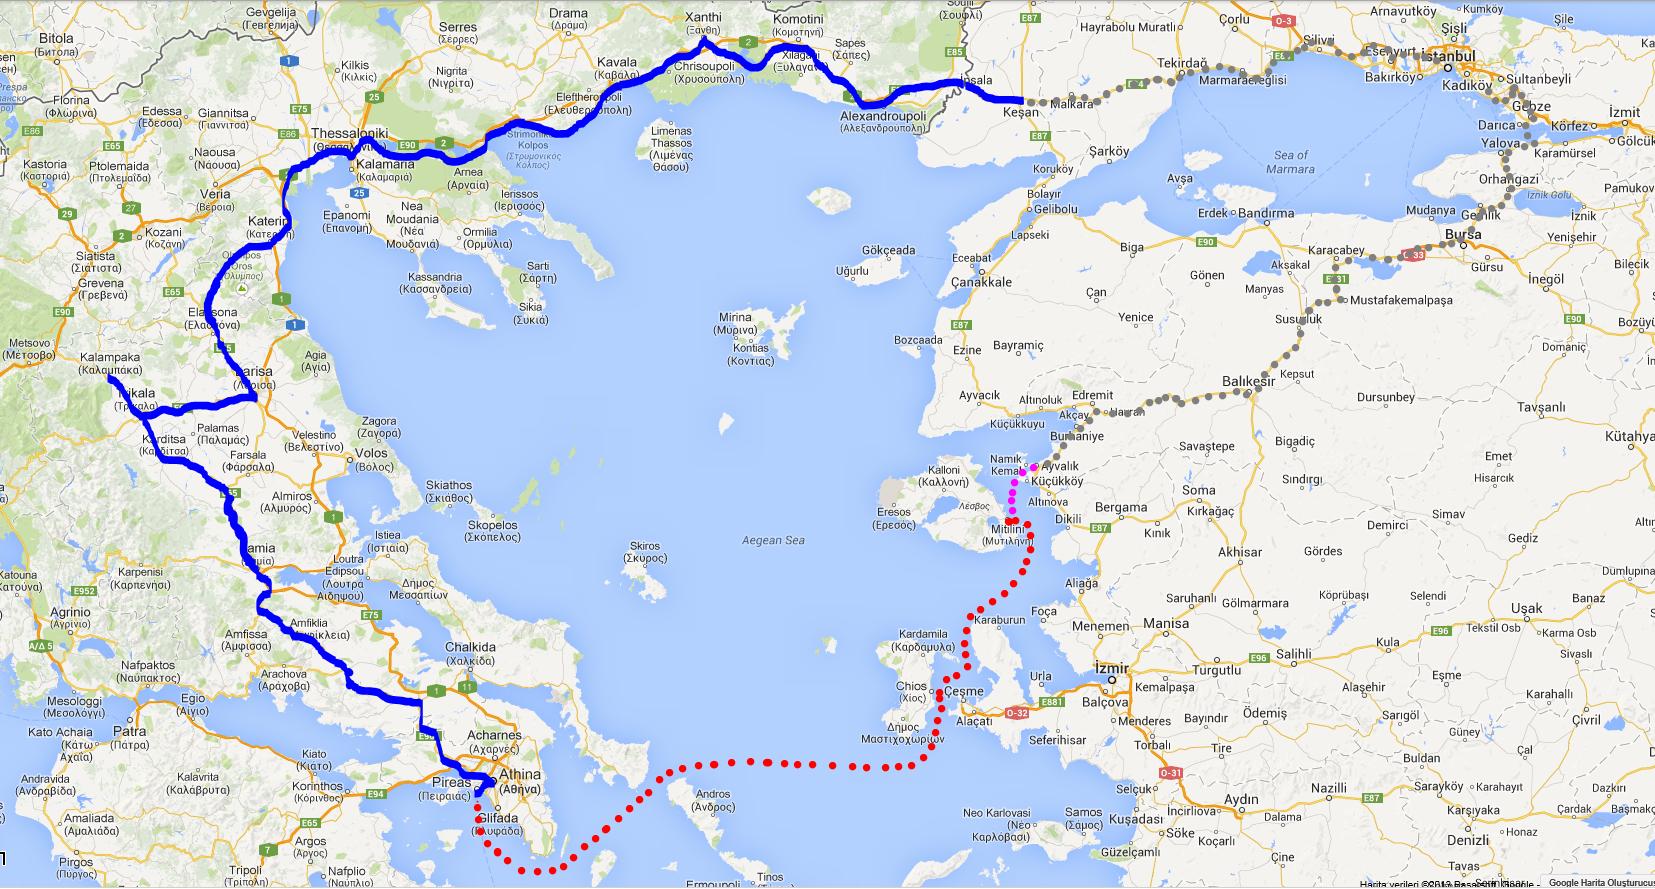 0_Yunanistan_turu.png